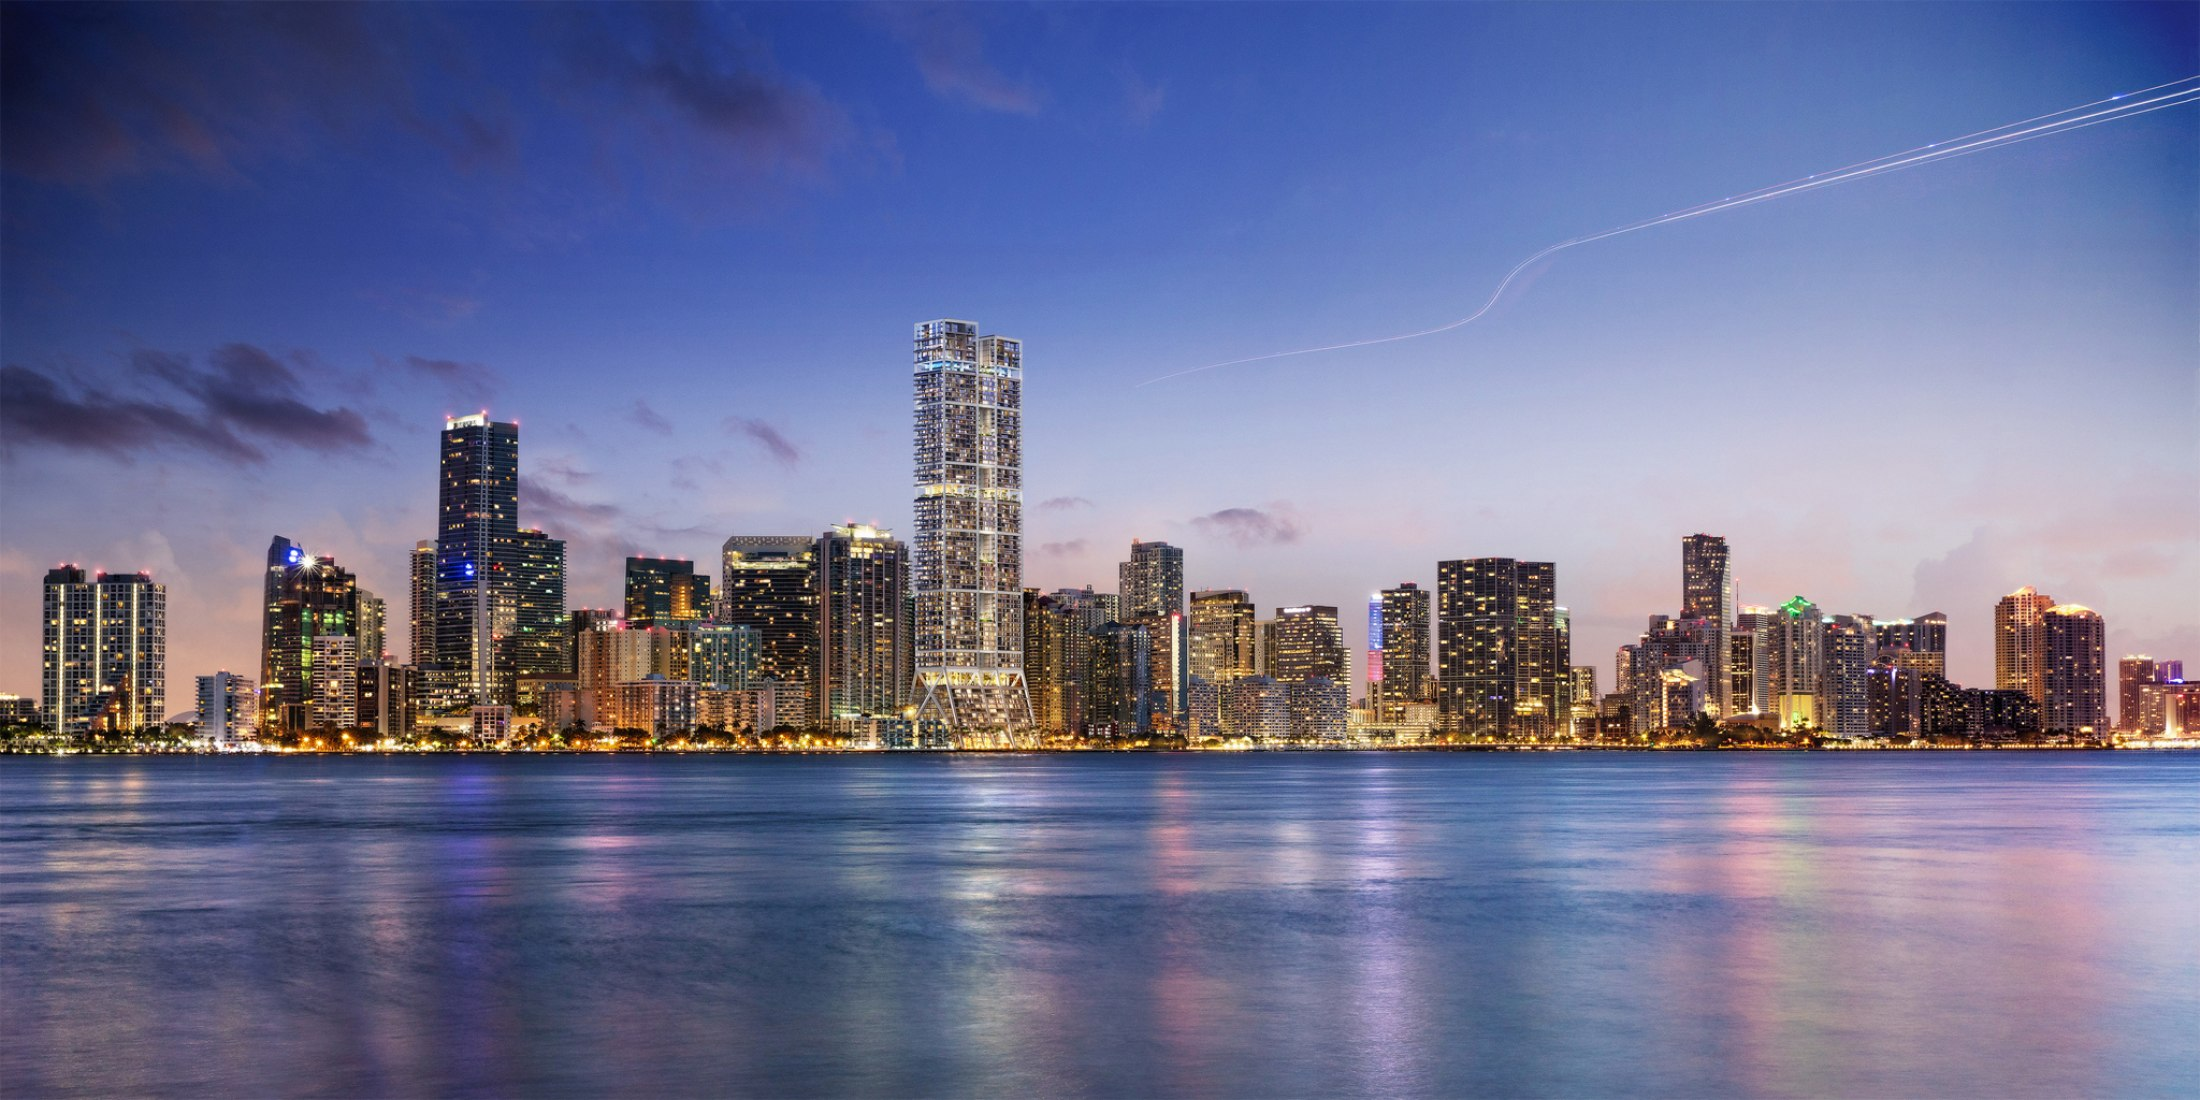 Torre residencial en Miami por Foster + Partners. Imagen © dbox_Foster + Partners